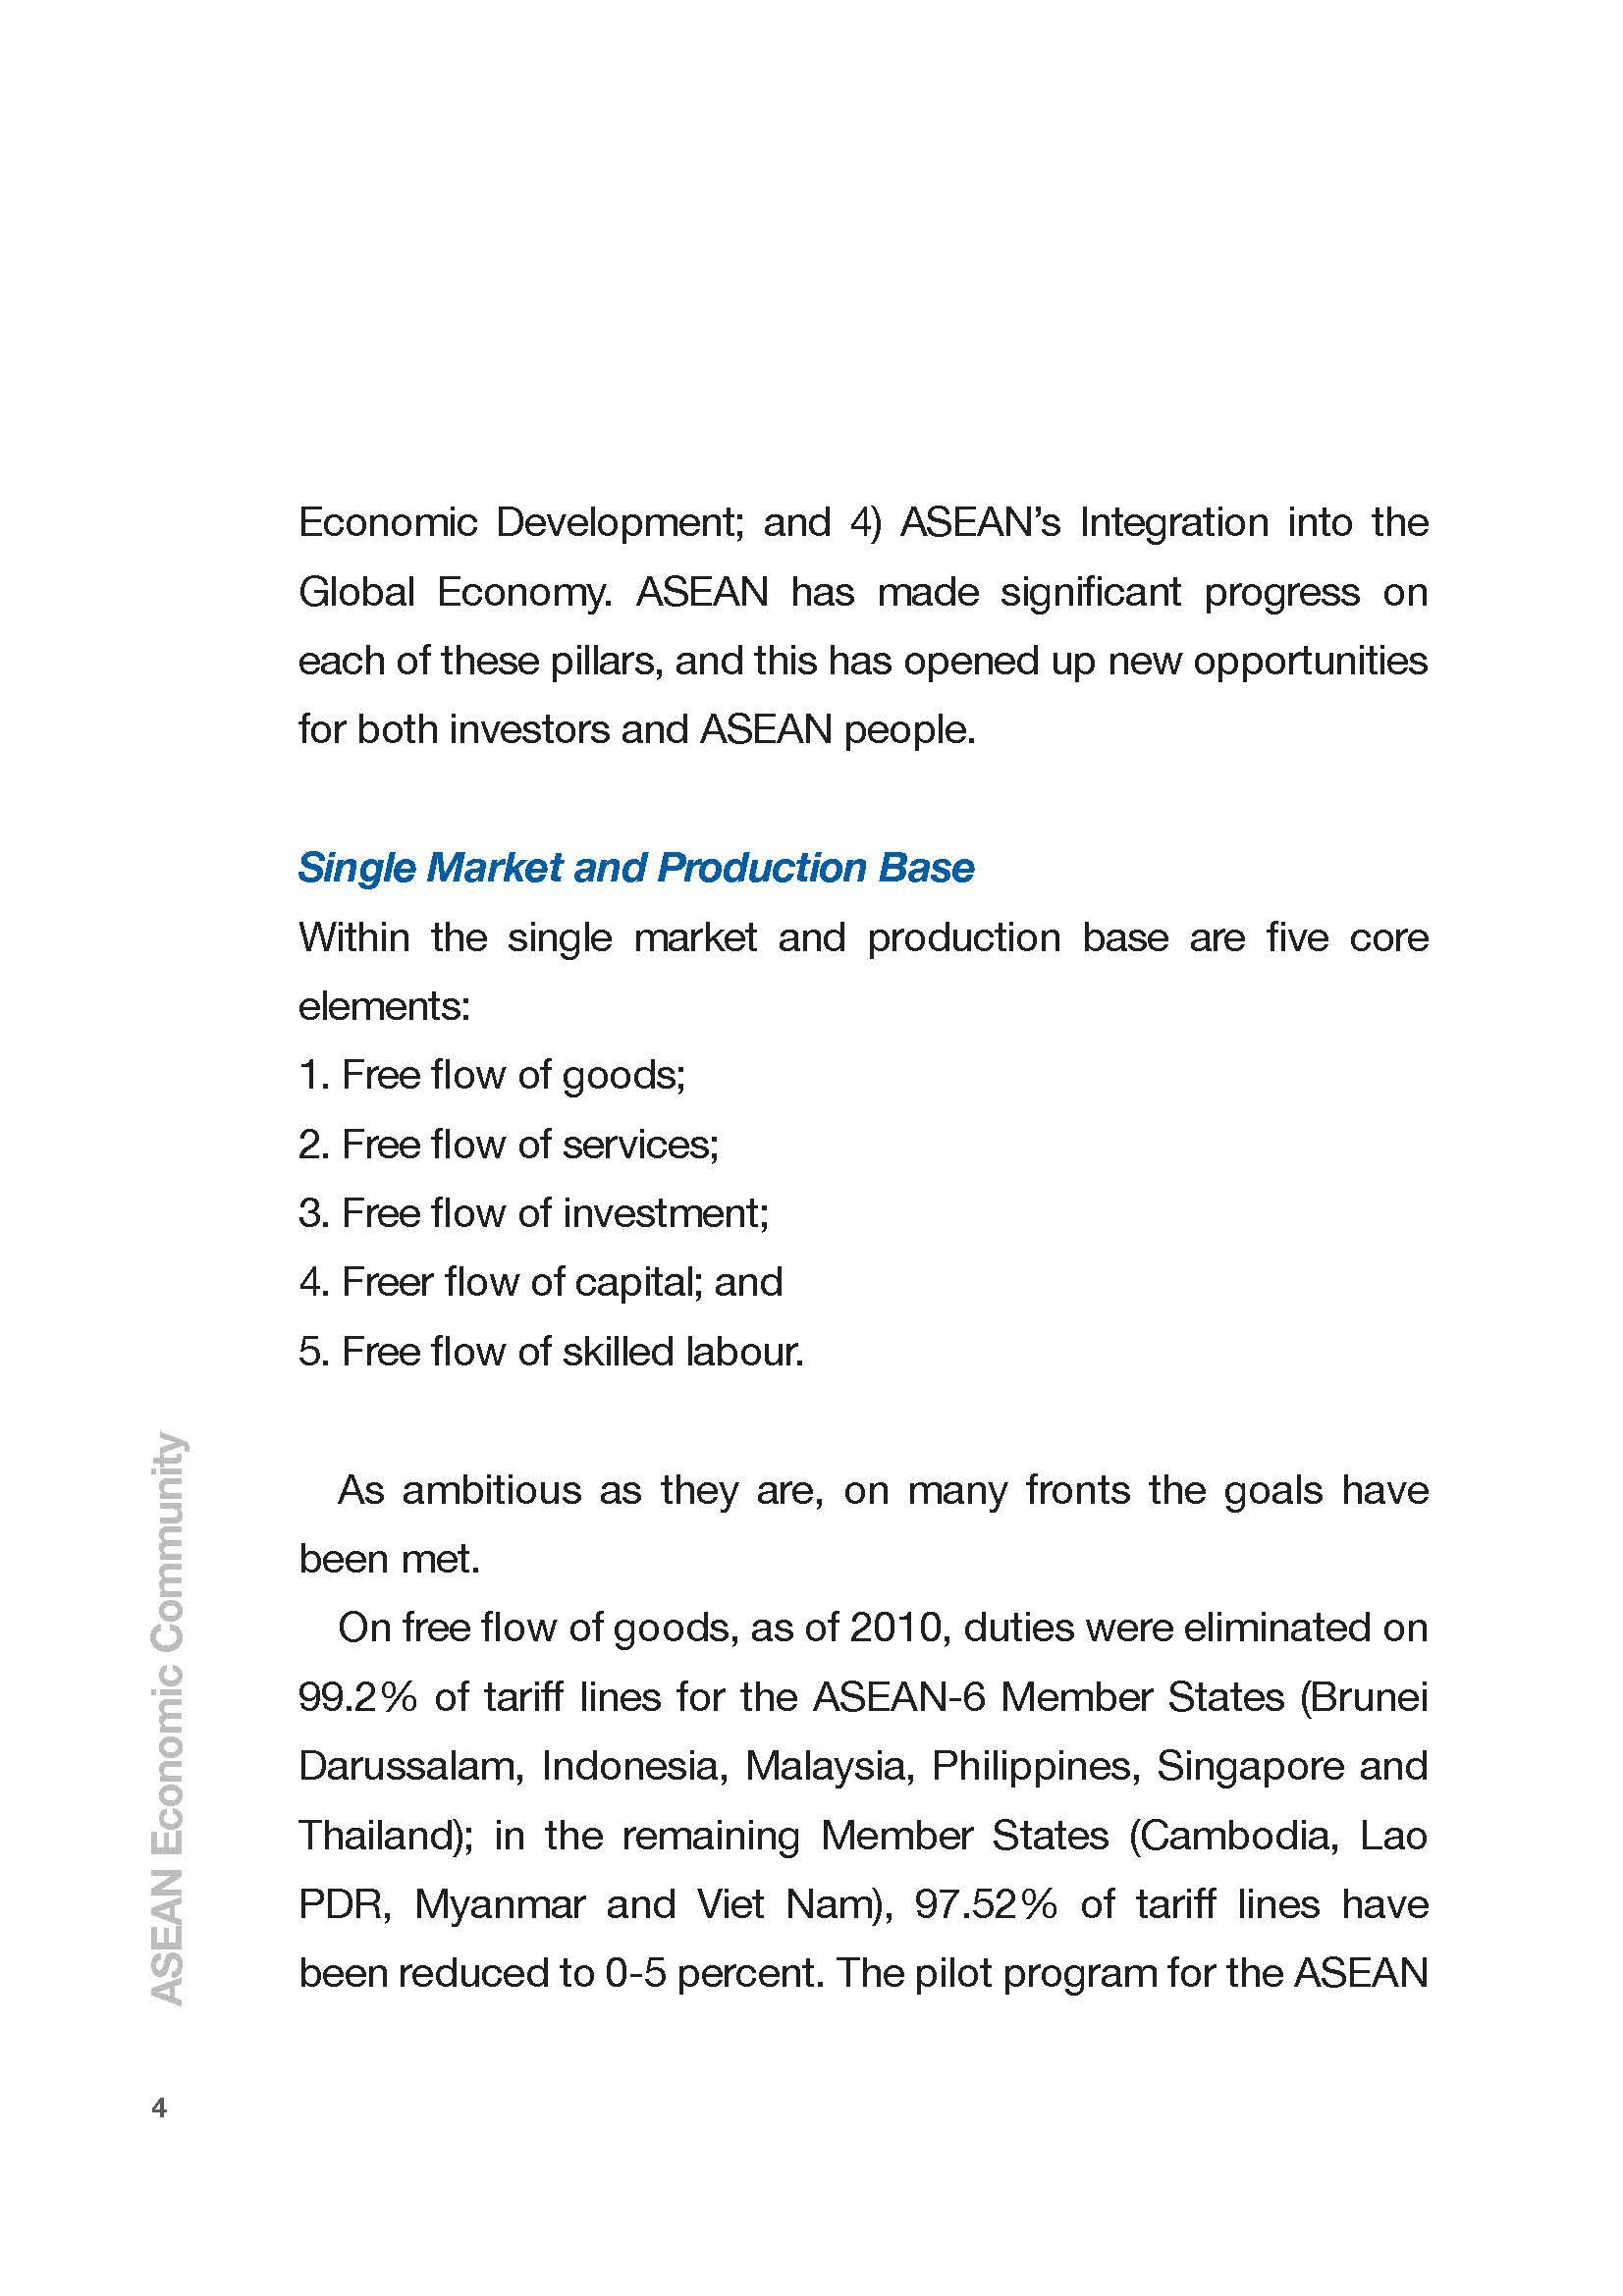 SME Corporation Malaysia - Pestech Sdn  Bhd